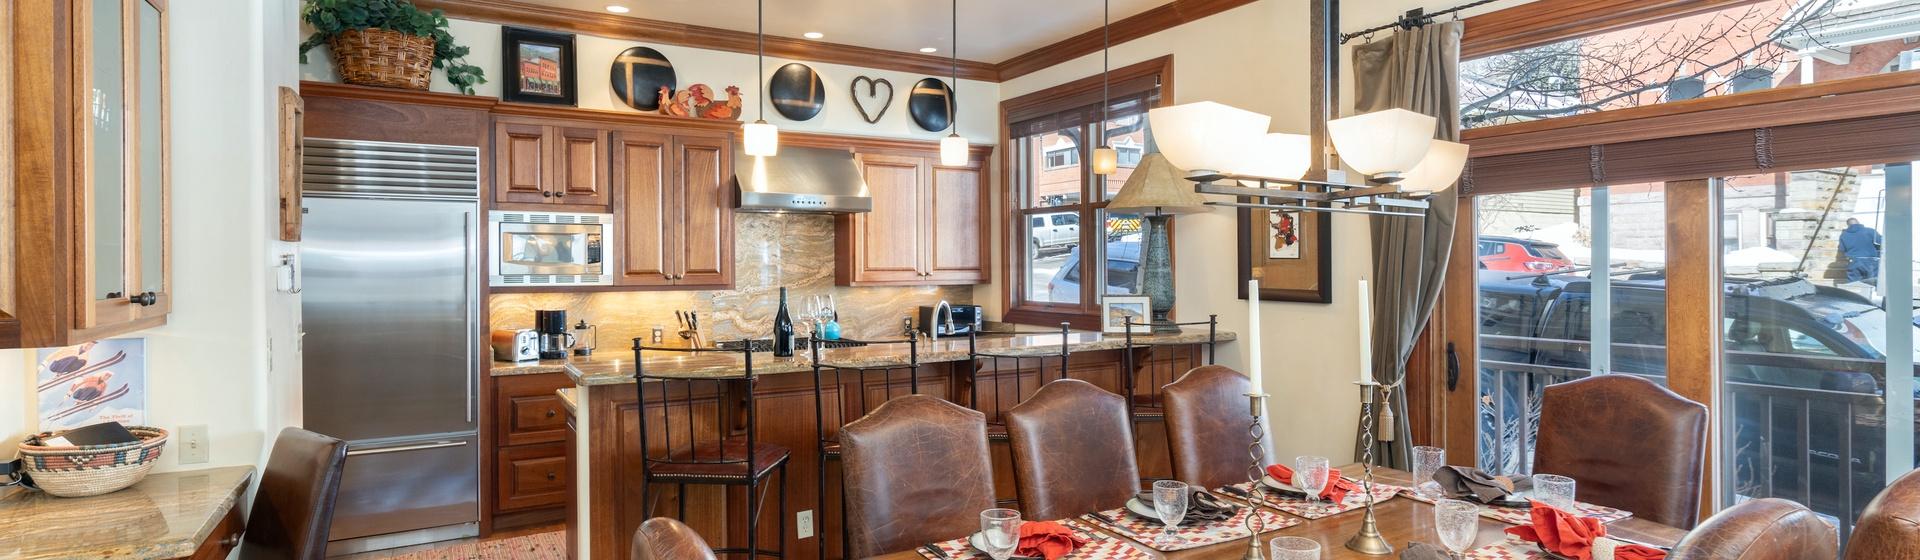 1.04-telluride-tres-casas-B-dining-kitchen-web.jpg